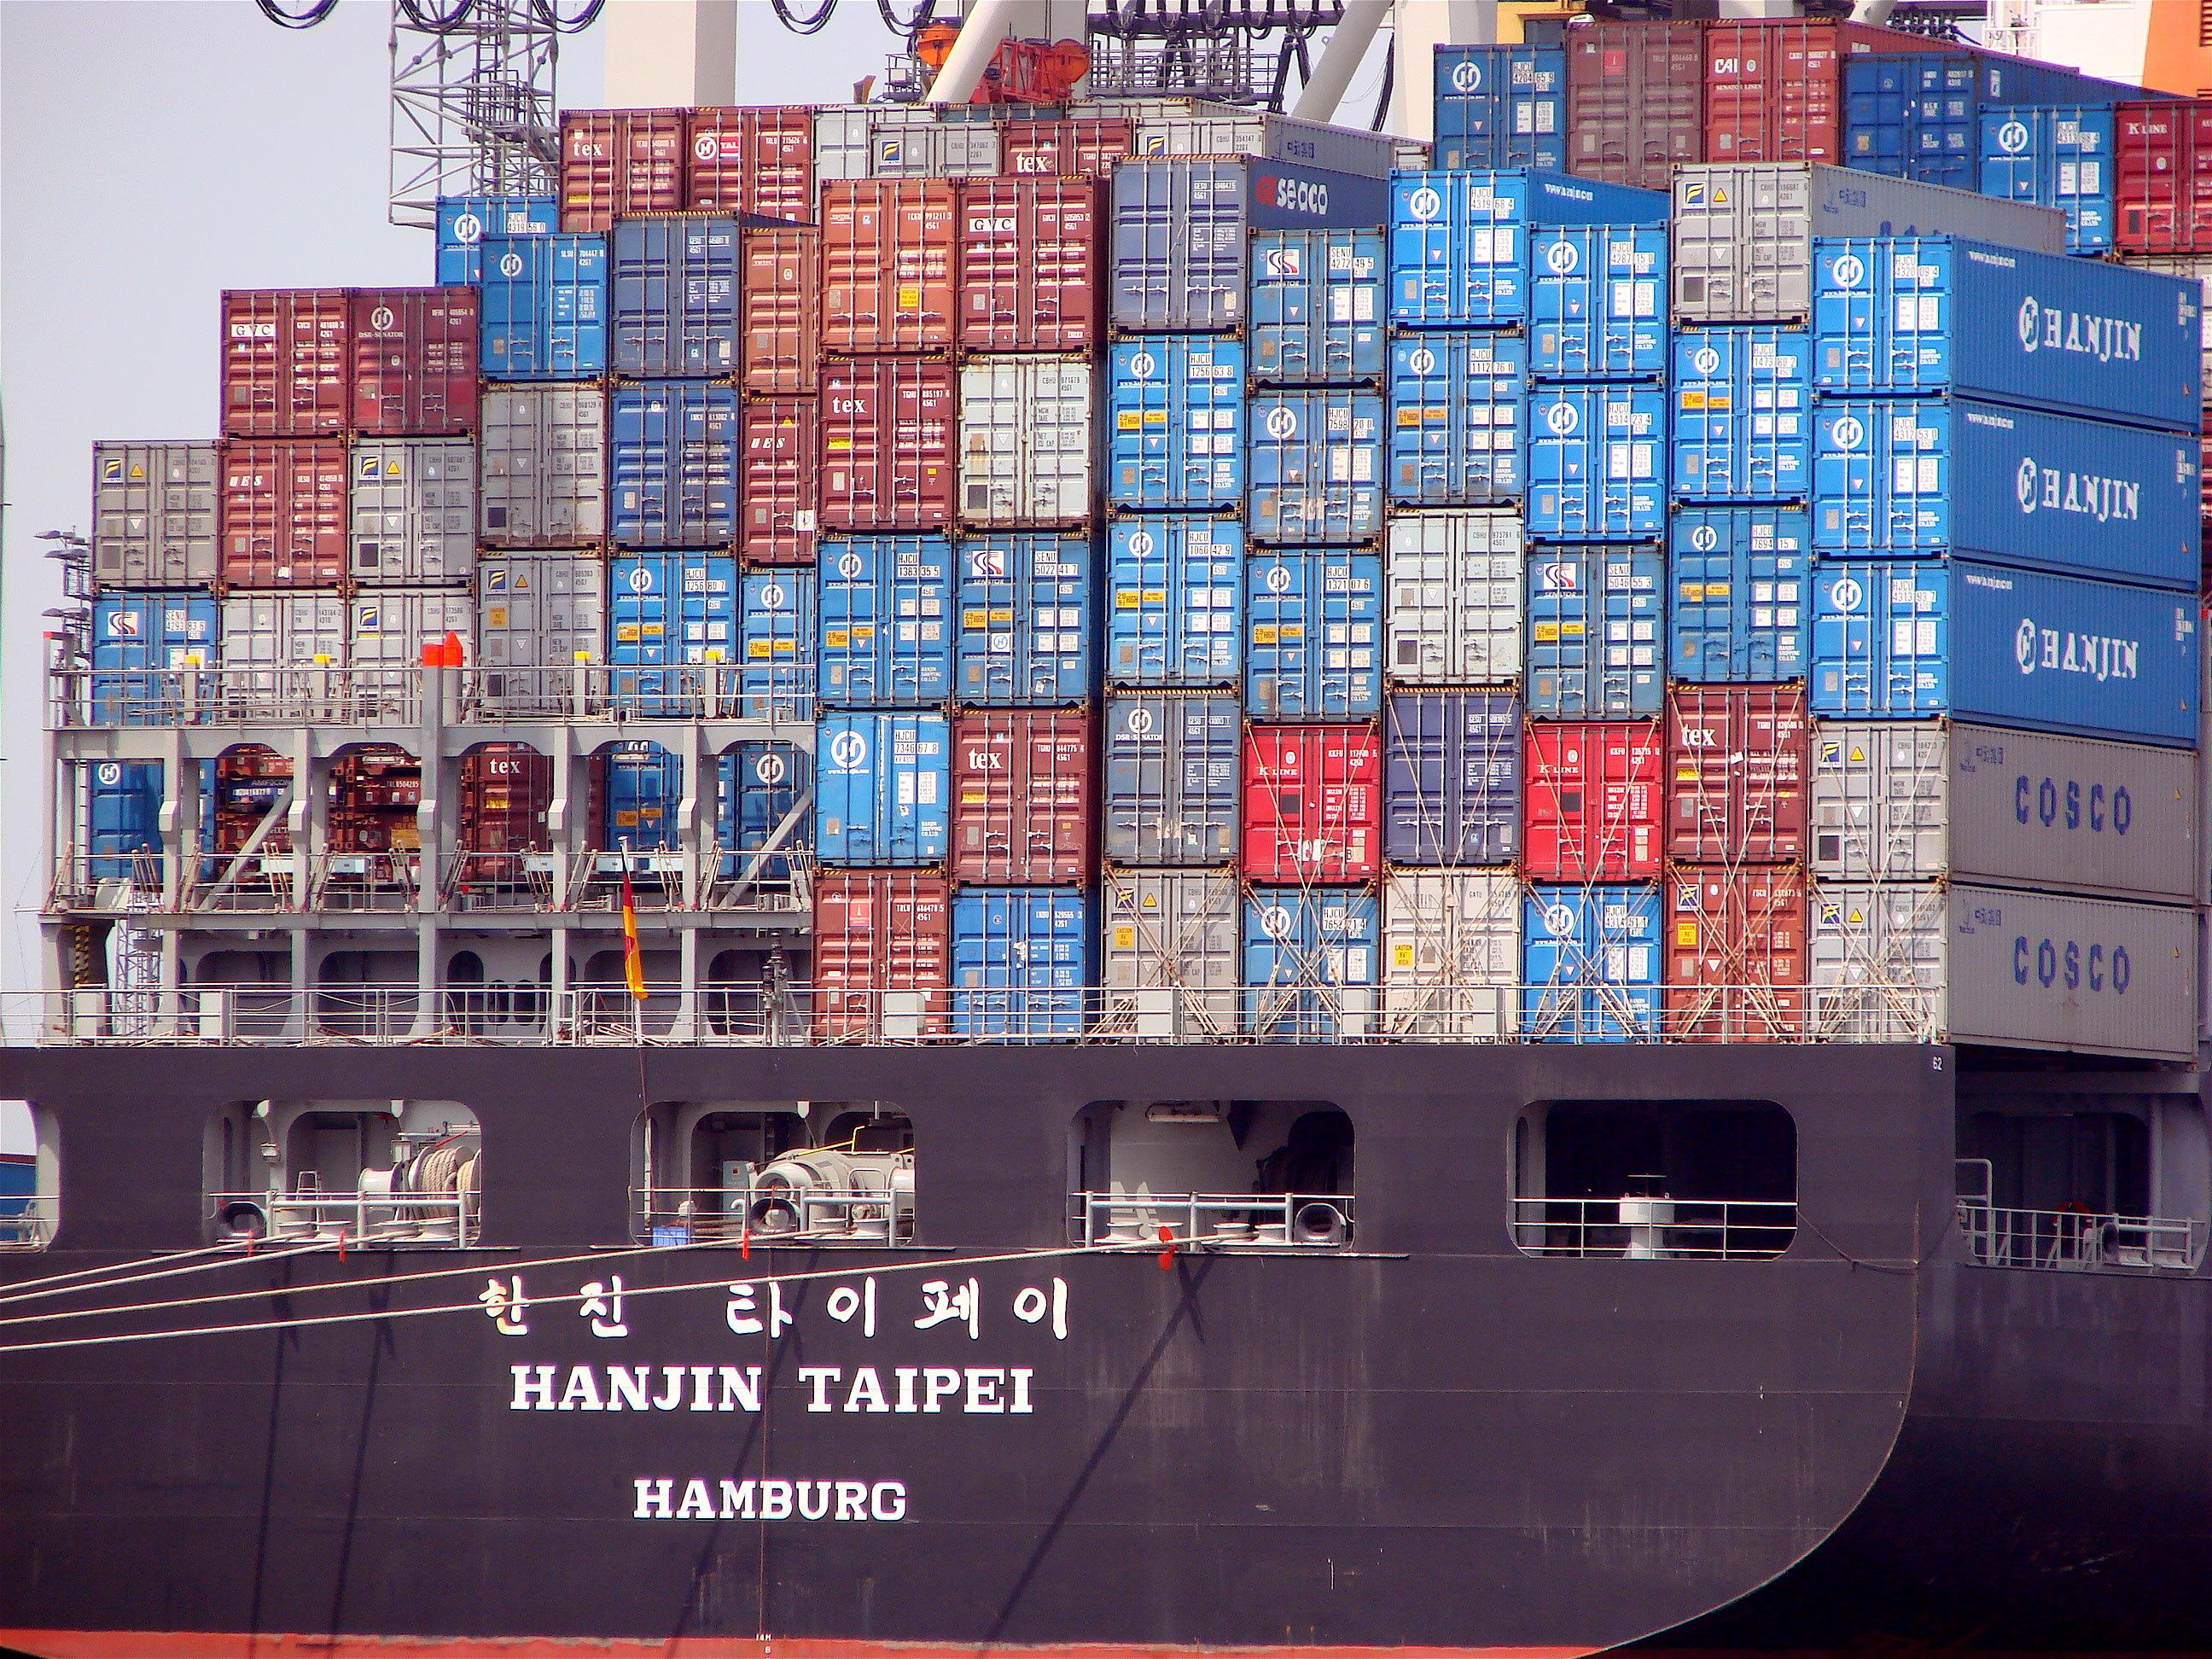 File:Container ship Hanjin Taipei.jpg - Wikimedia Commons